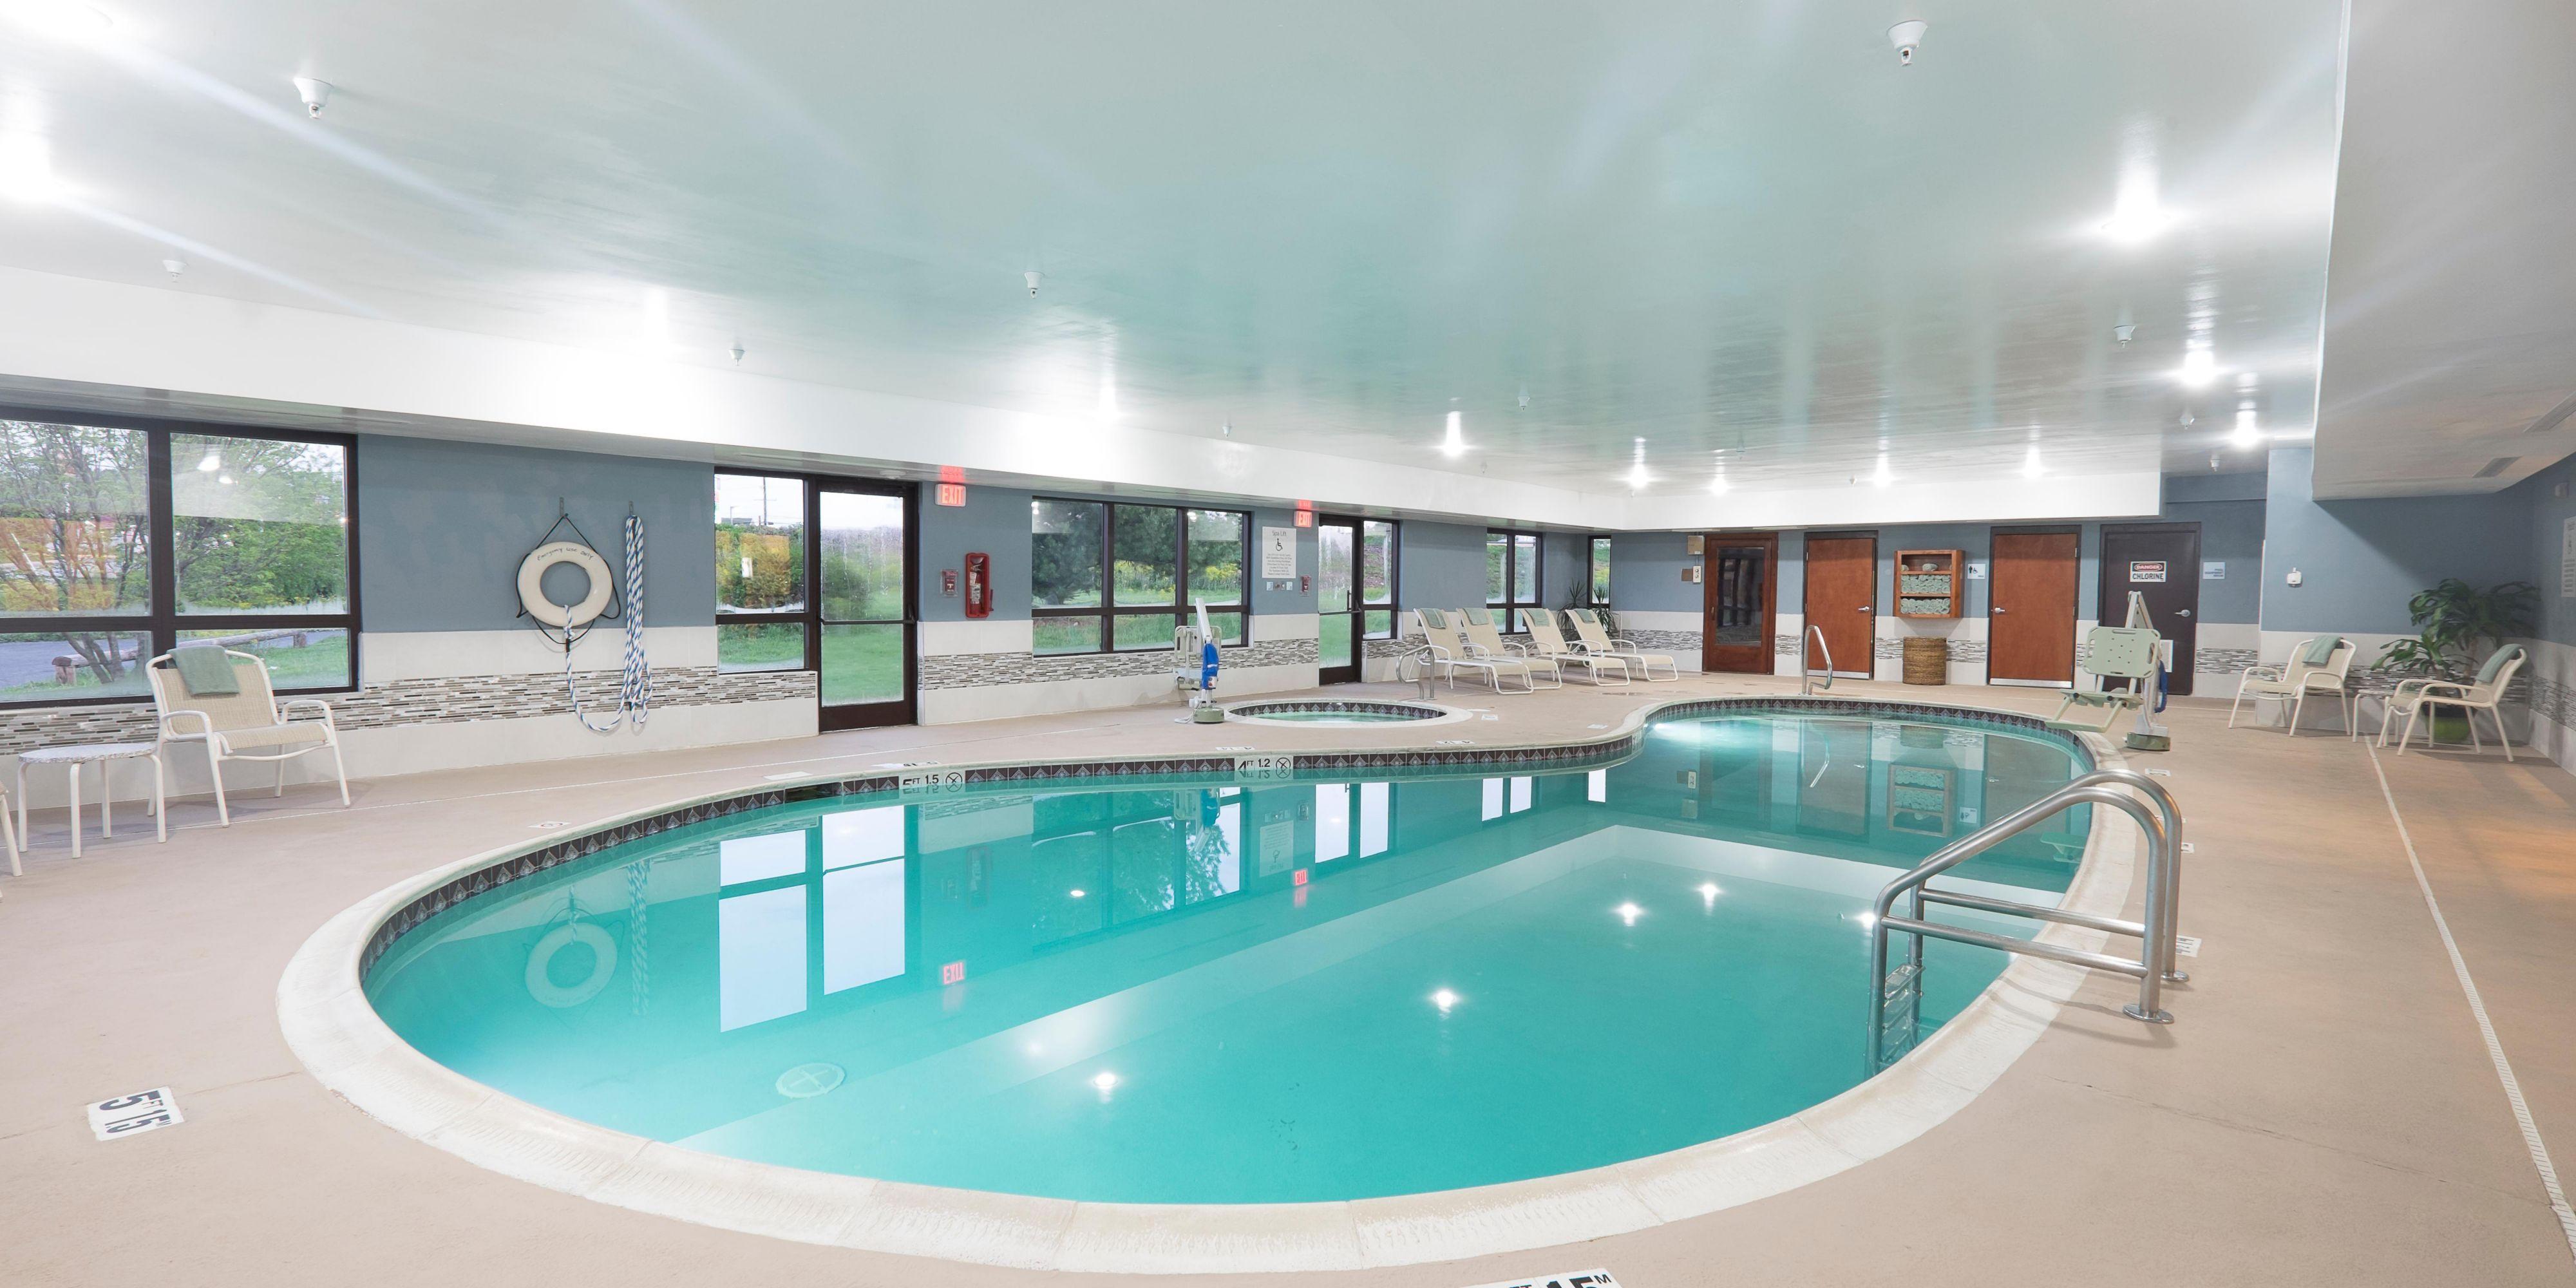 Holiday Inn Express And Suites Waynesboro 3898317107 2x1